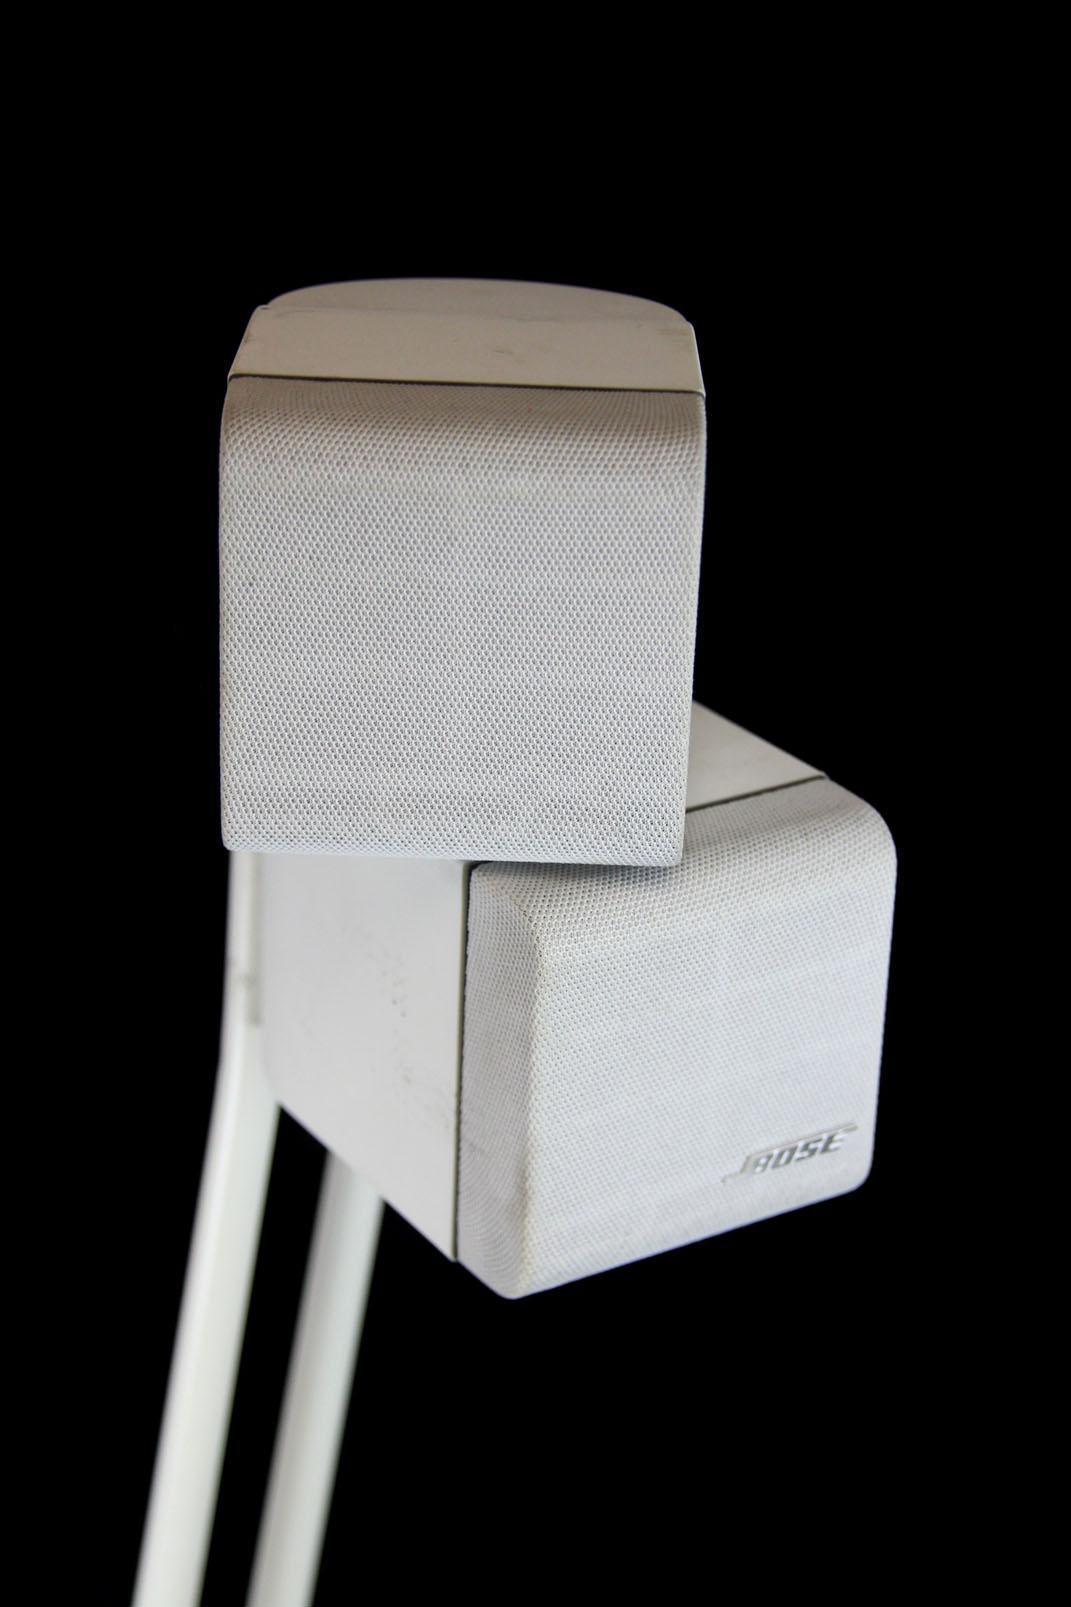 bose stereo lautsprecher st nder acoustimass doppel cube hifi speaker weiss ebay. Black Bedroom Furniture Sets. Home Design Ideas